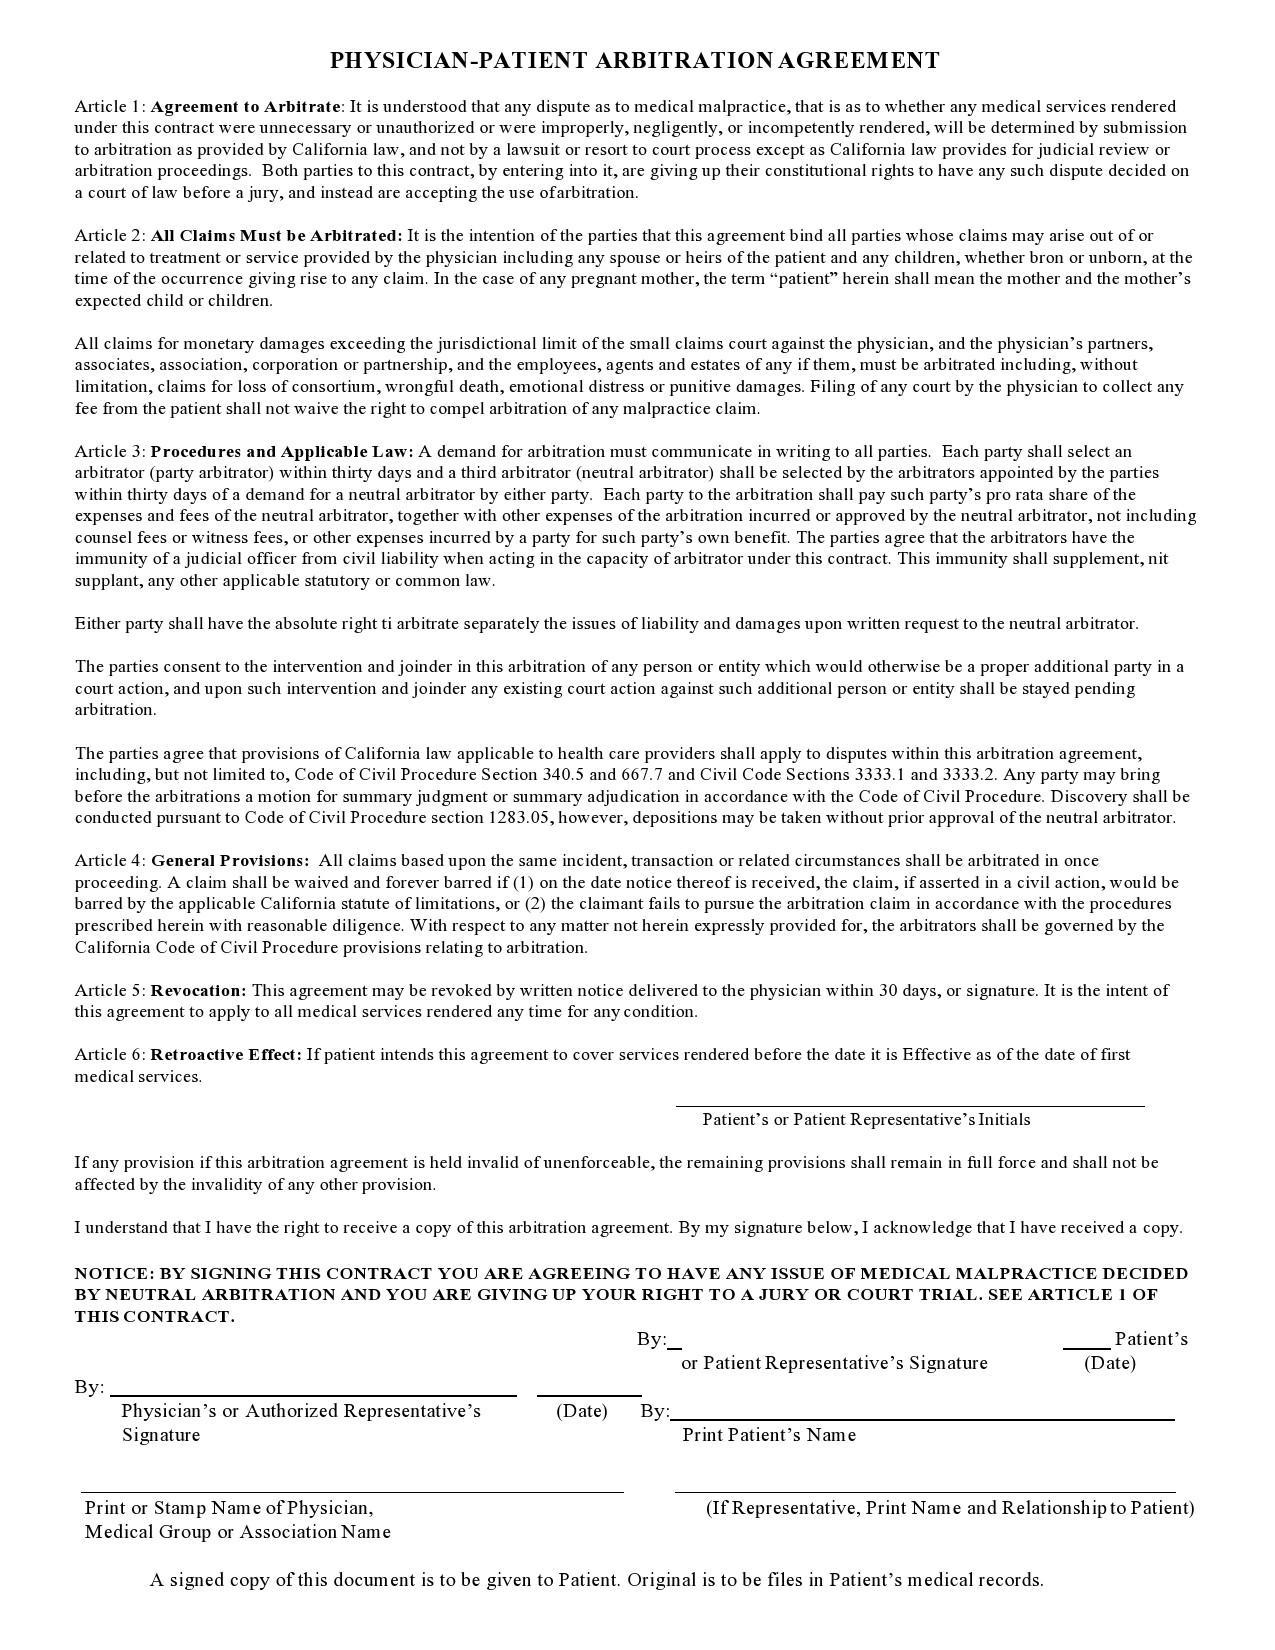 Free arbitration agreement 18